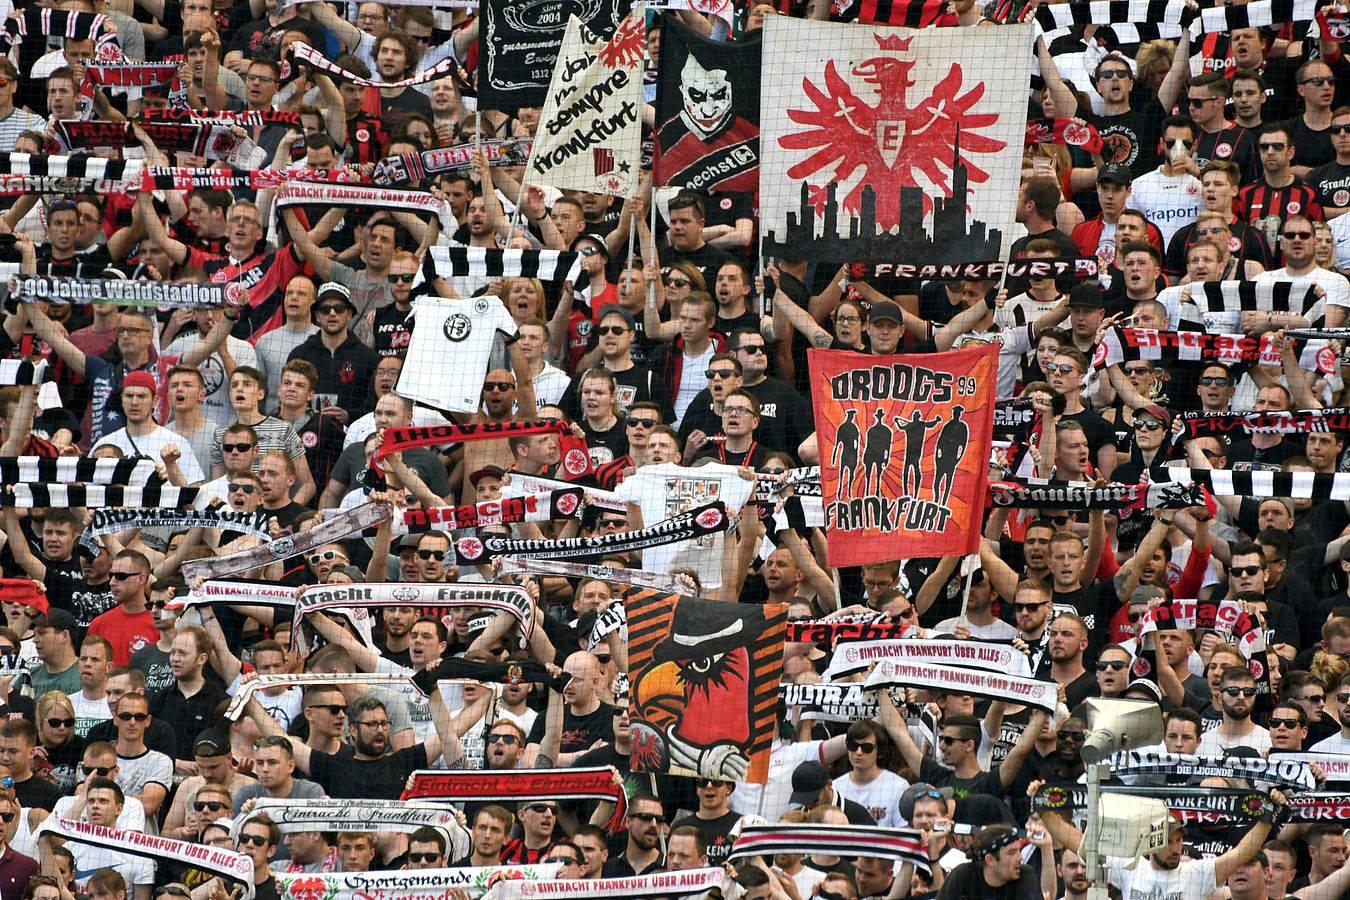 Torcida do Eintracht Frankfurt (Foto: Reprodução)